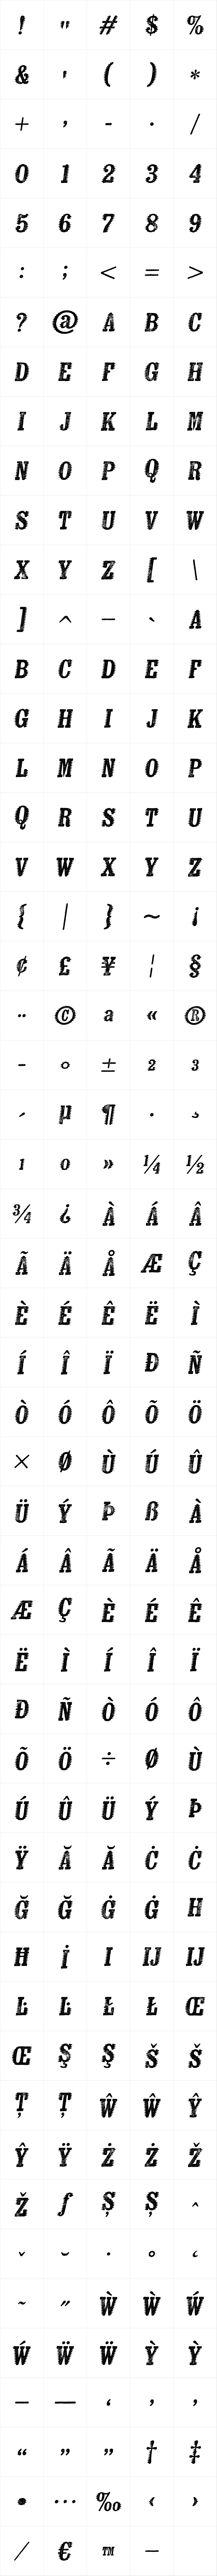 Kiln Serif Spiked Italic